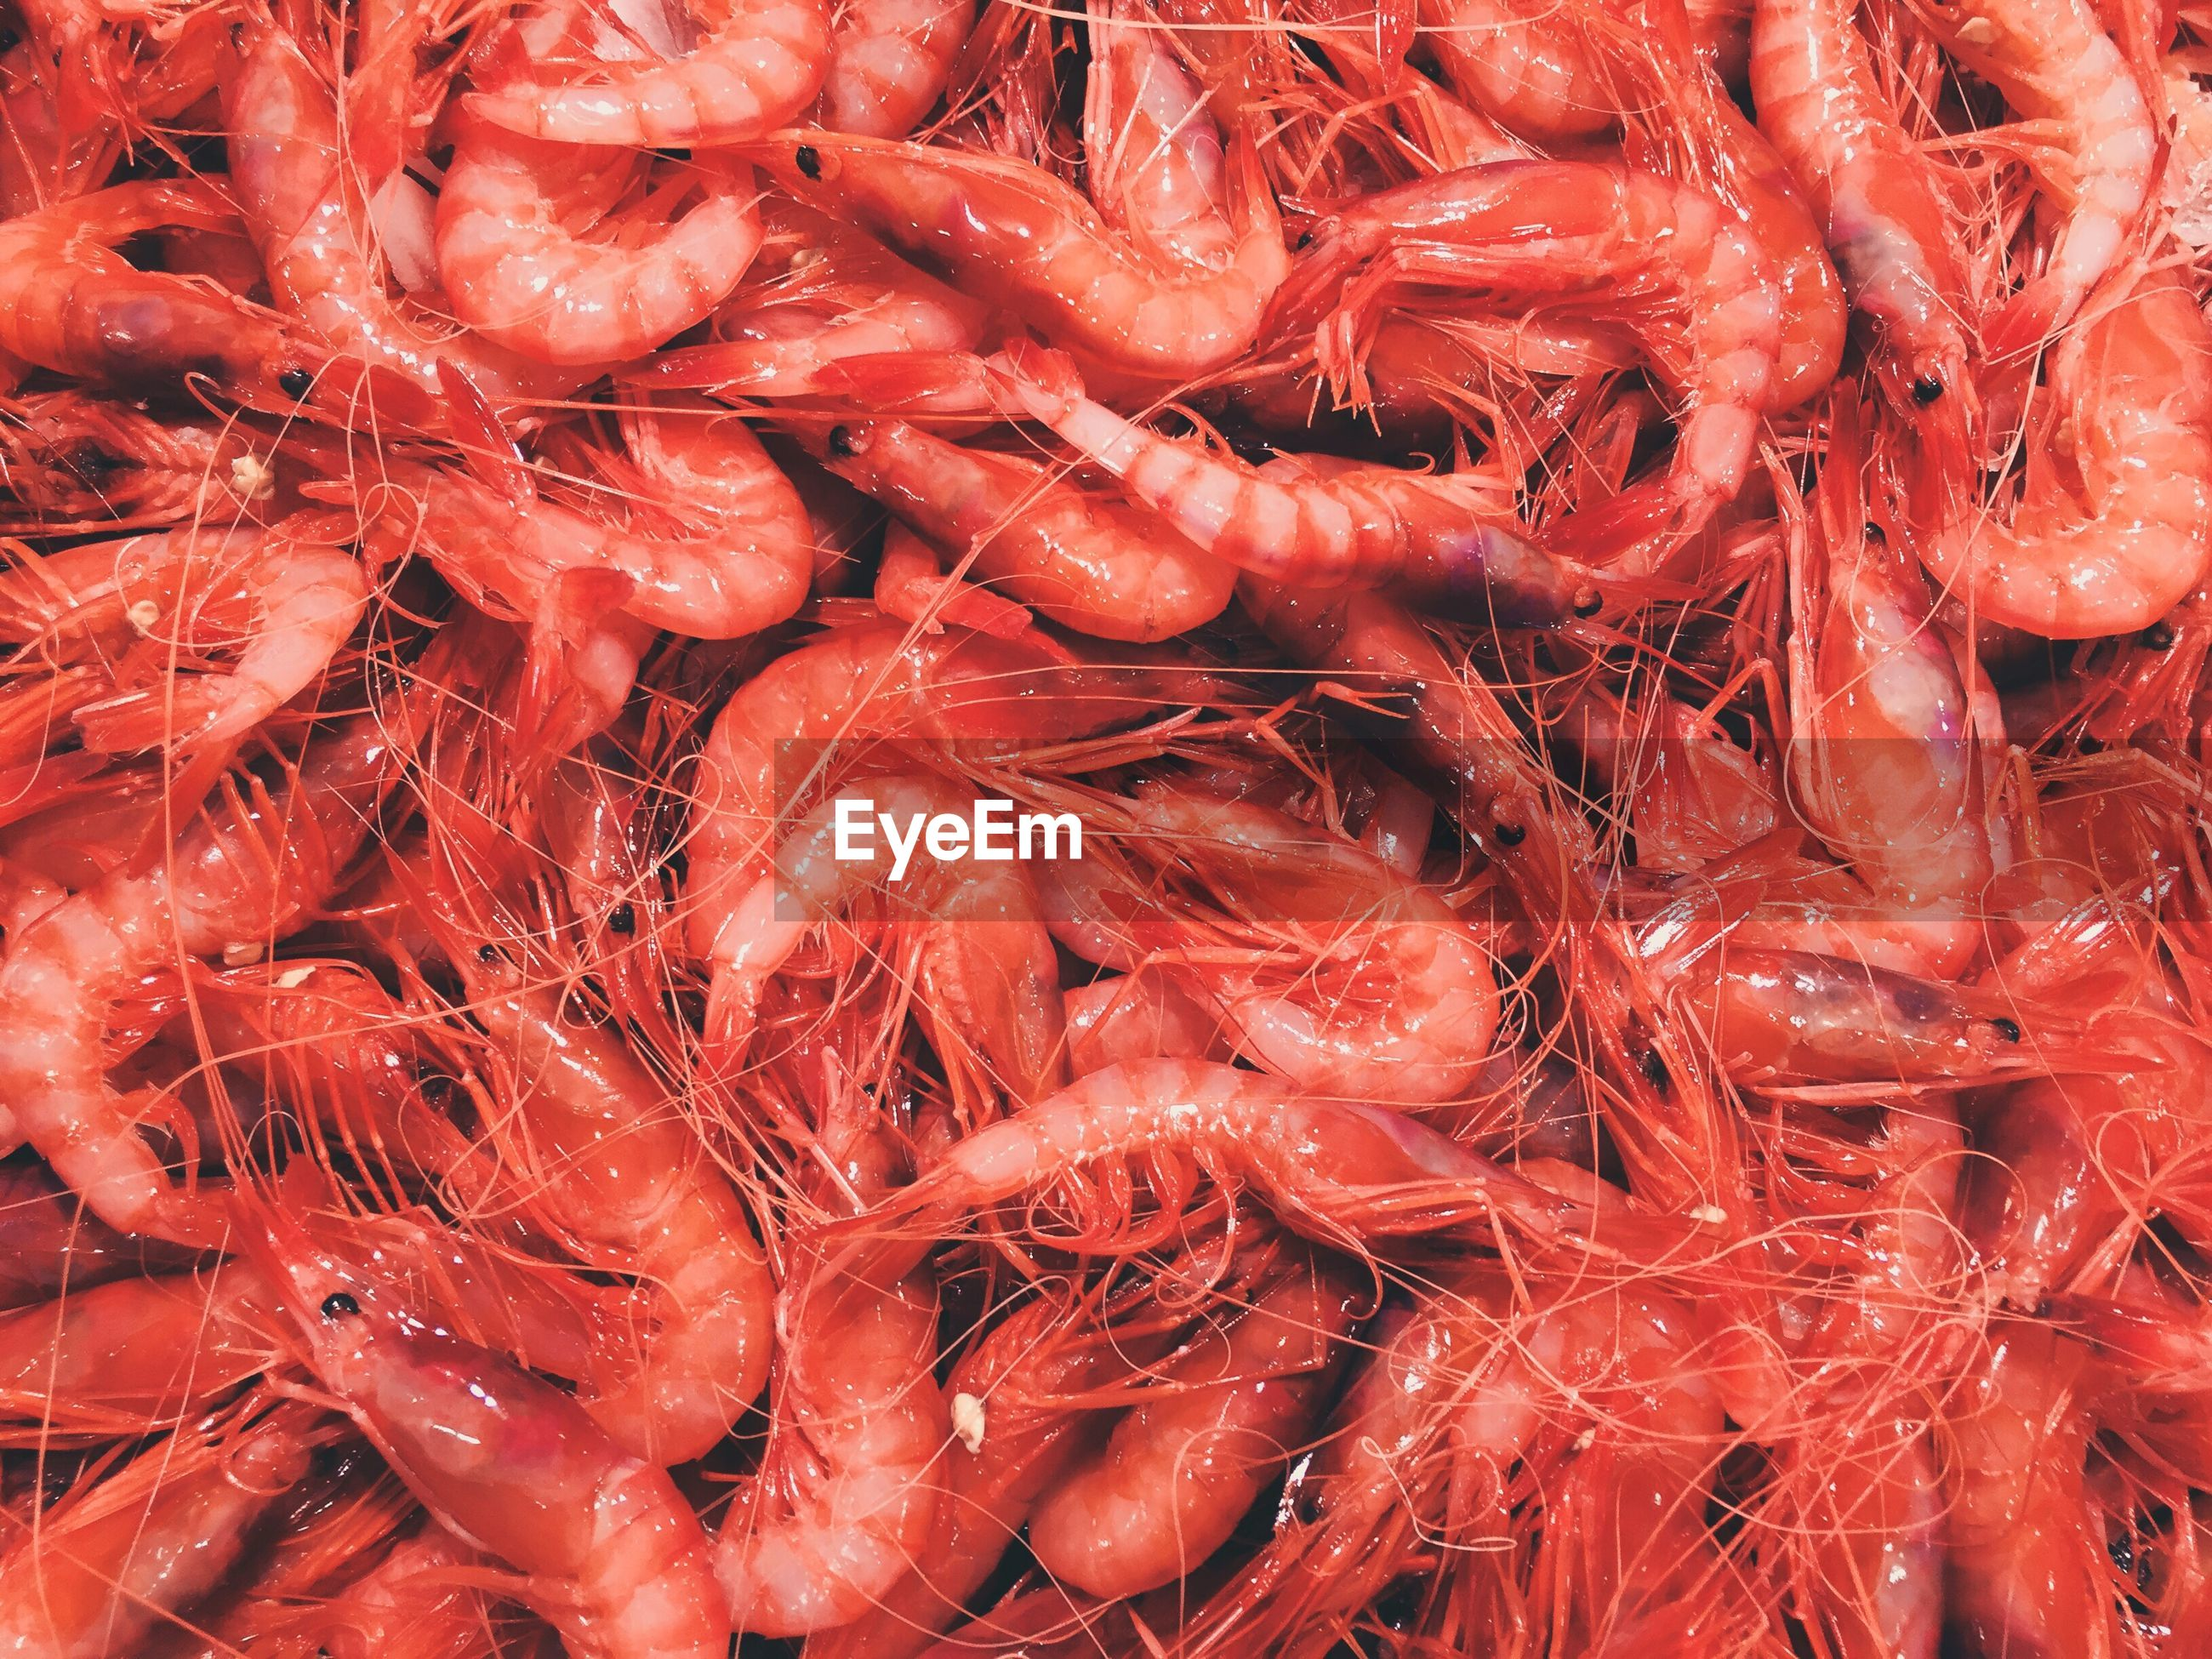 Full frame shot of prawns for sale at fish market